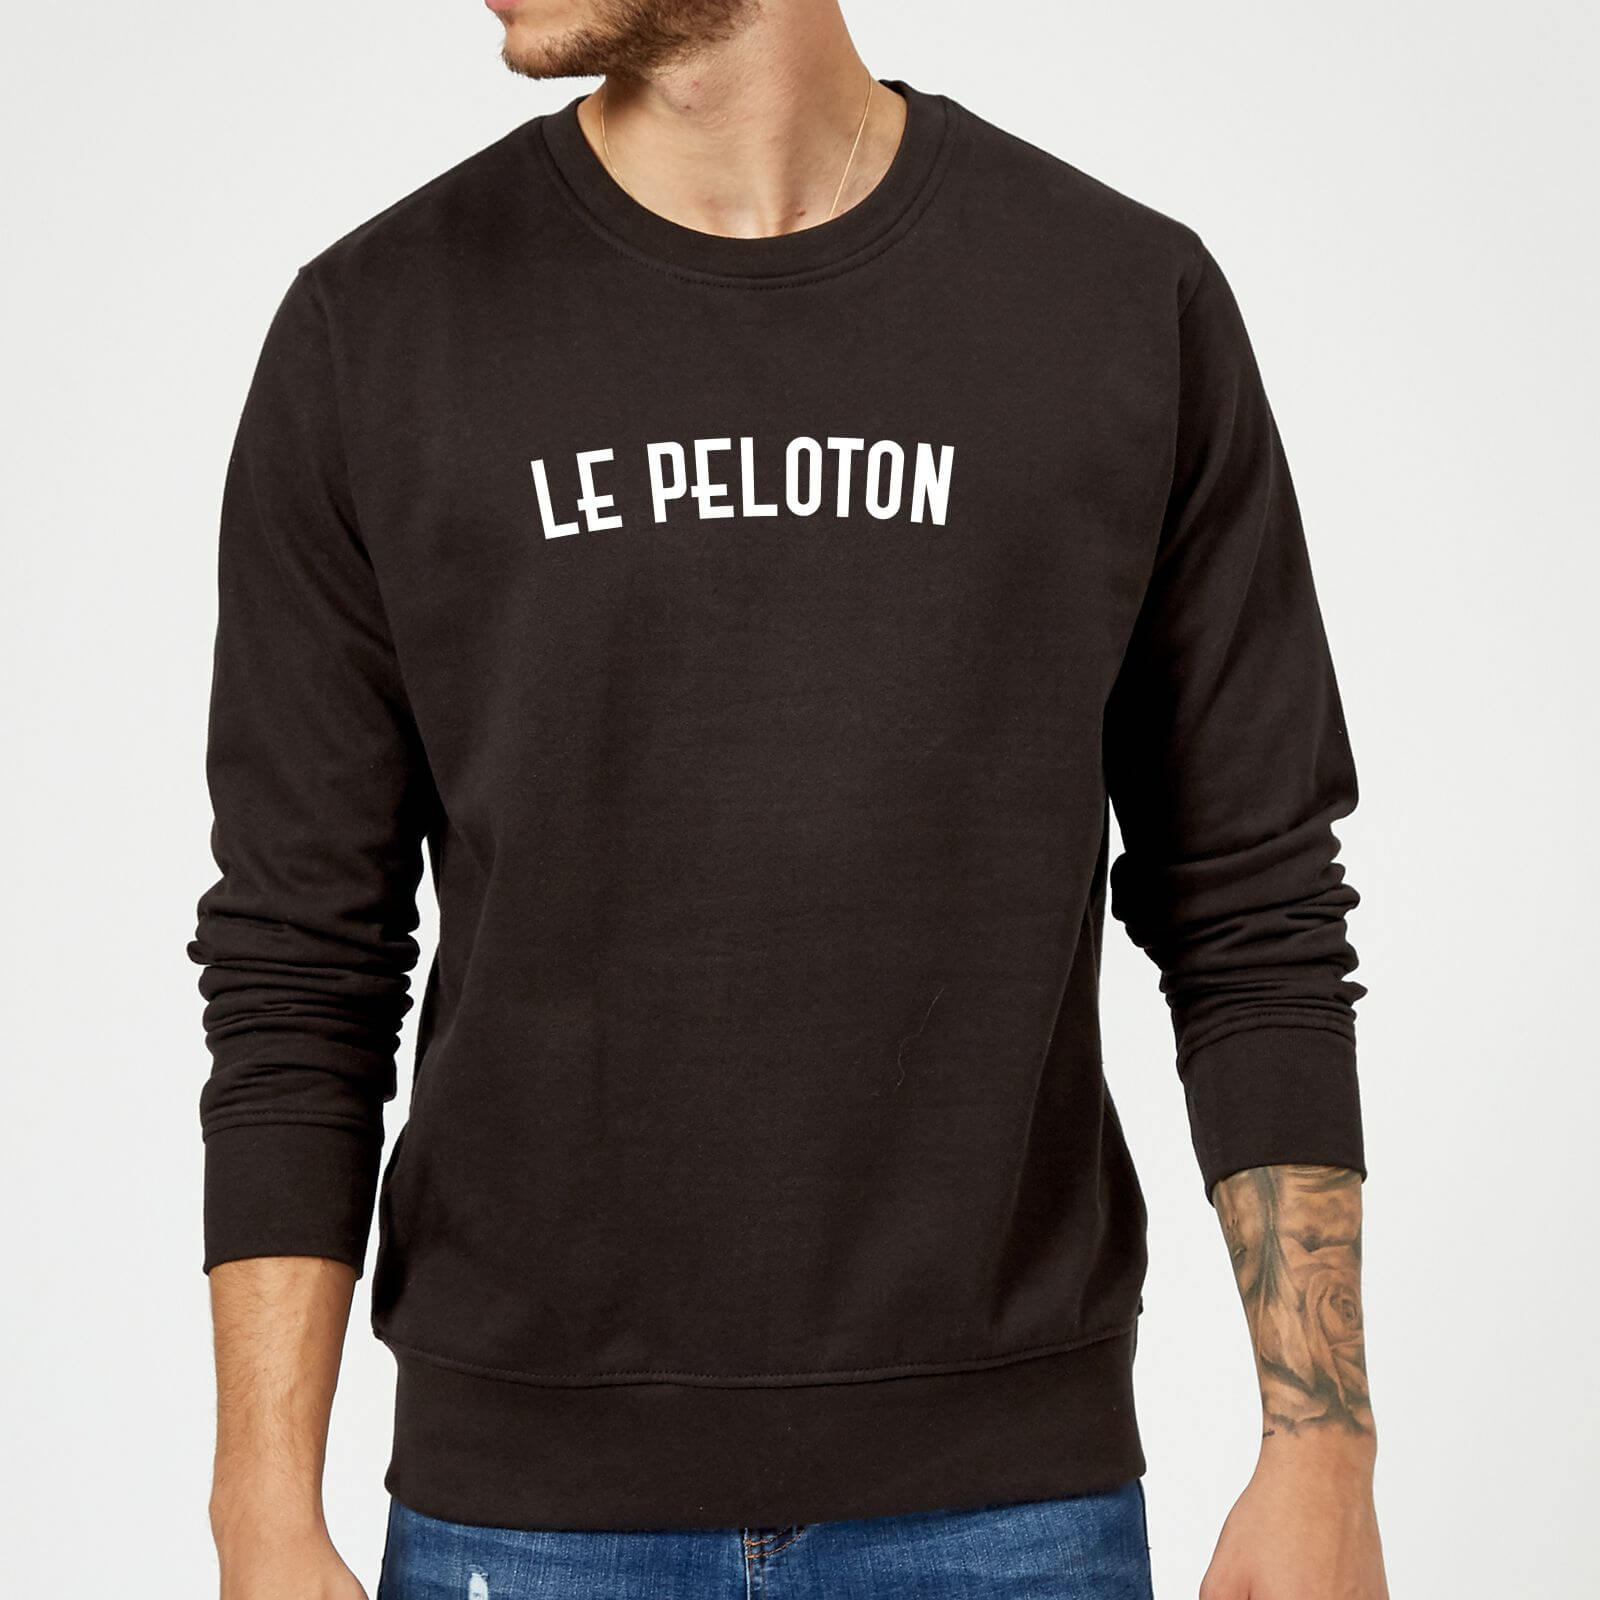 Le Peloton Sweatshirt - S - White